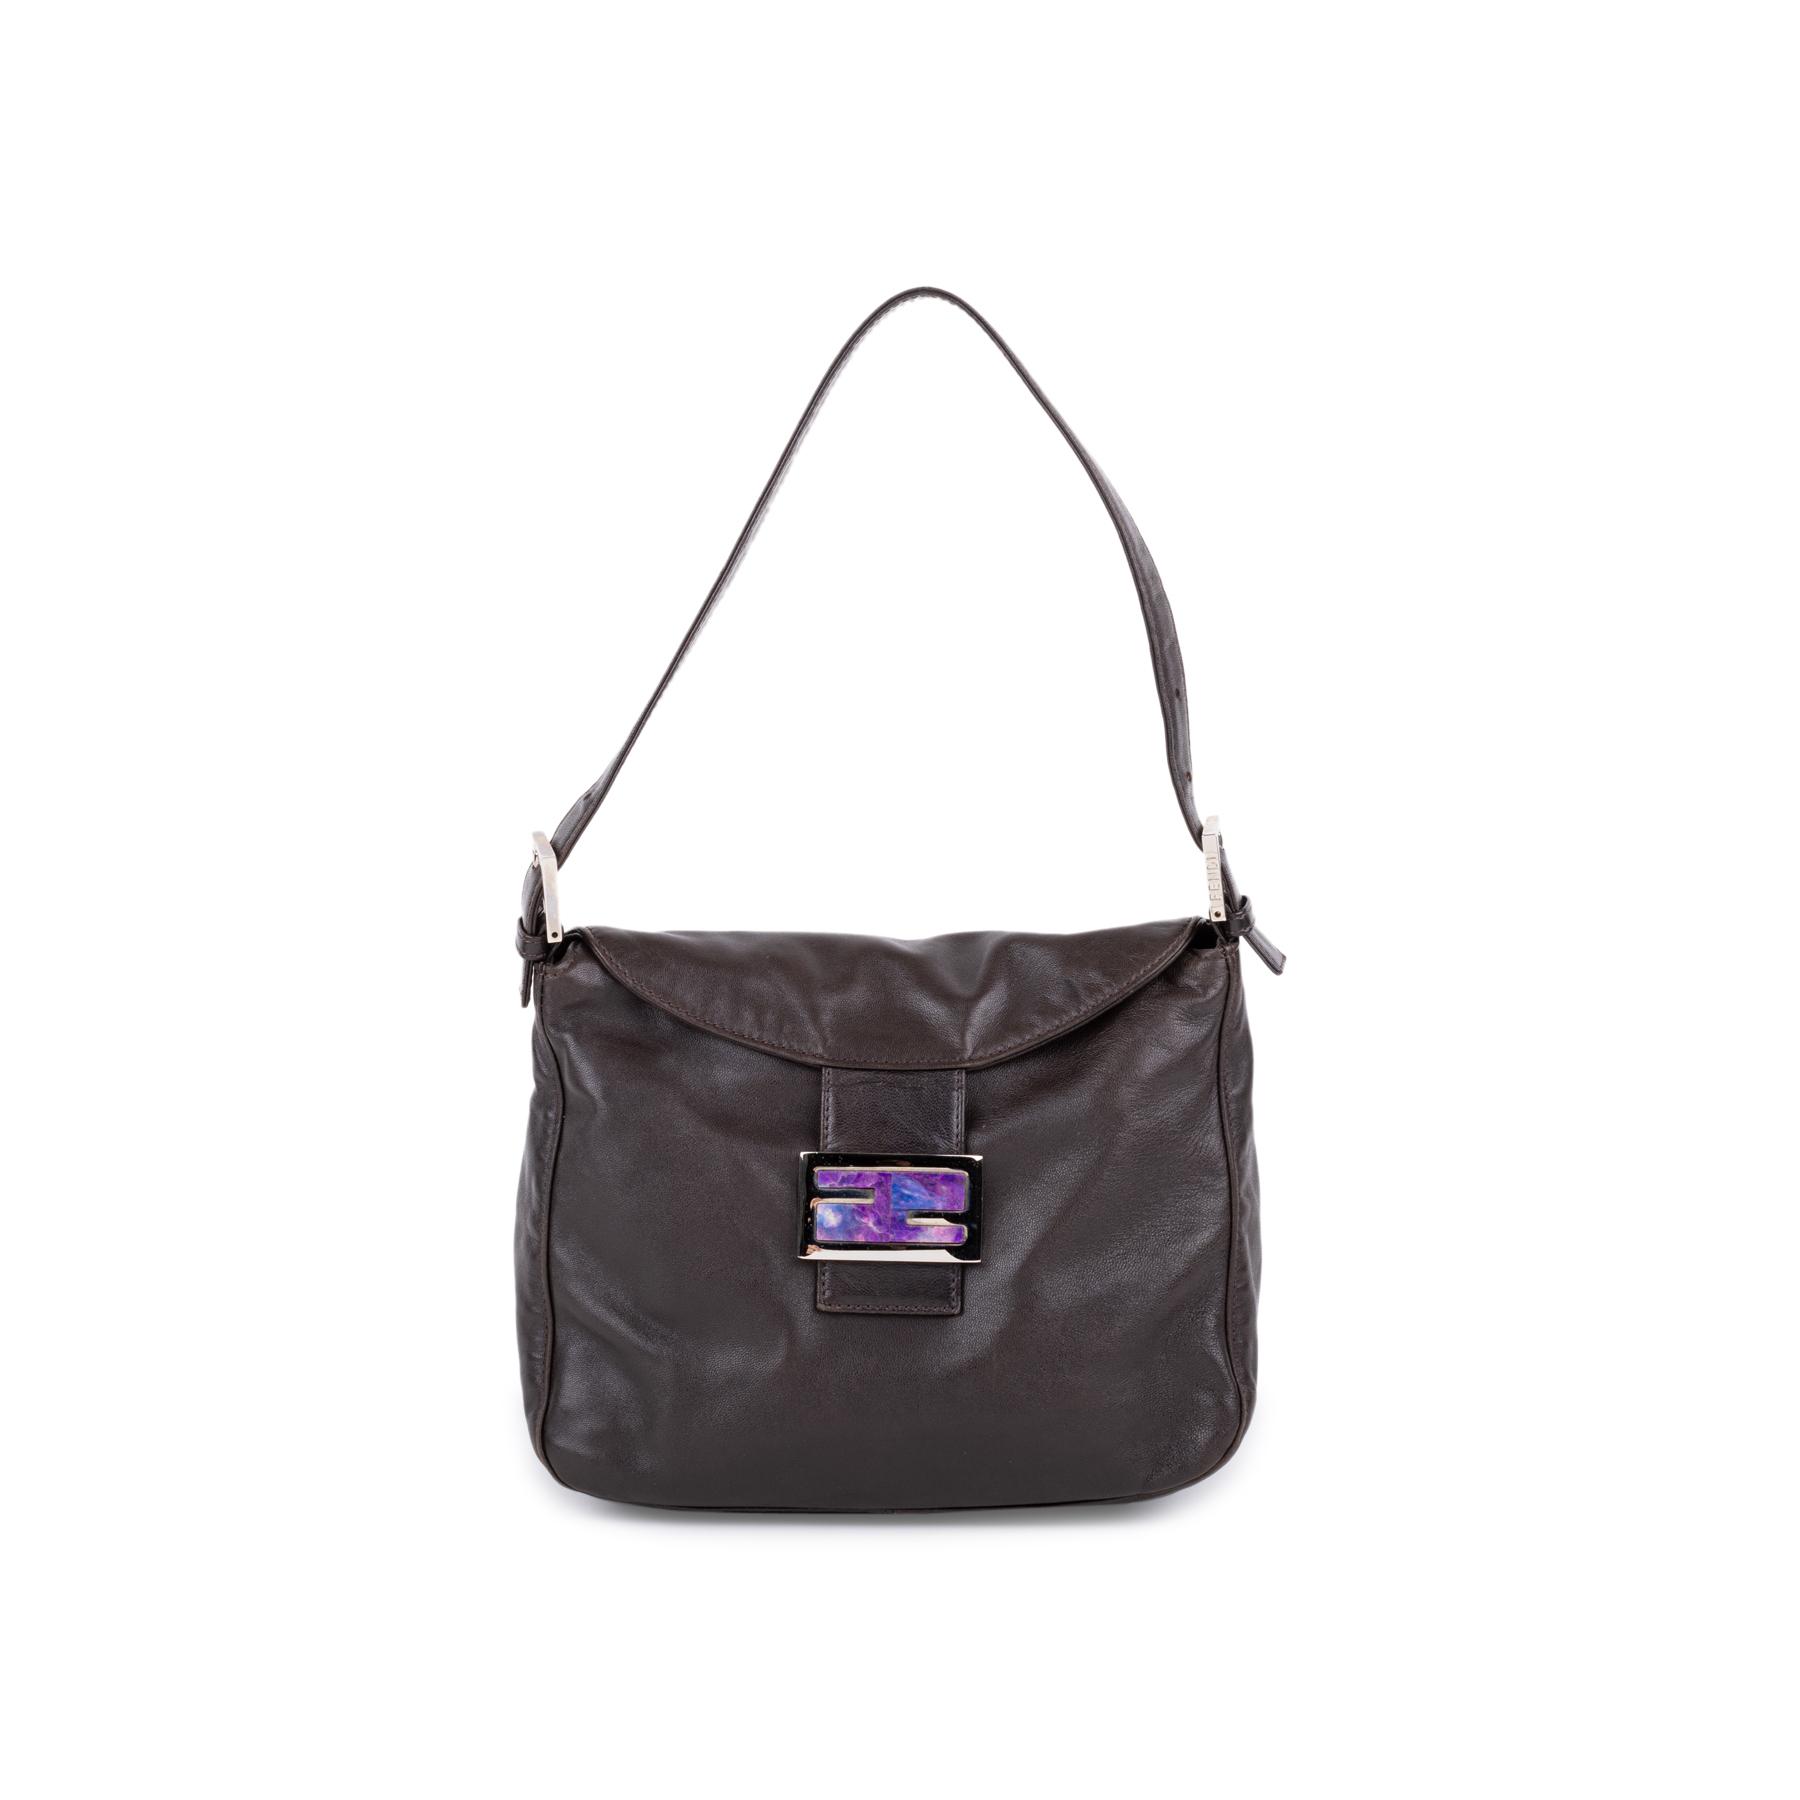 221f053b15e5 Authentic Second Hand Fendi Marble Logo Shoulder Bag (PSS-581-00010 ...